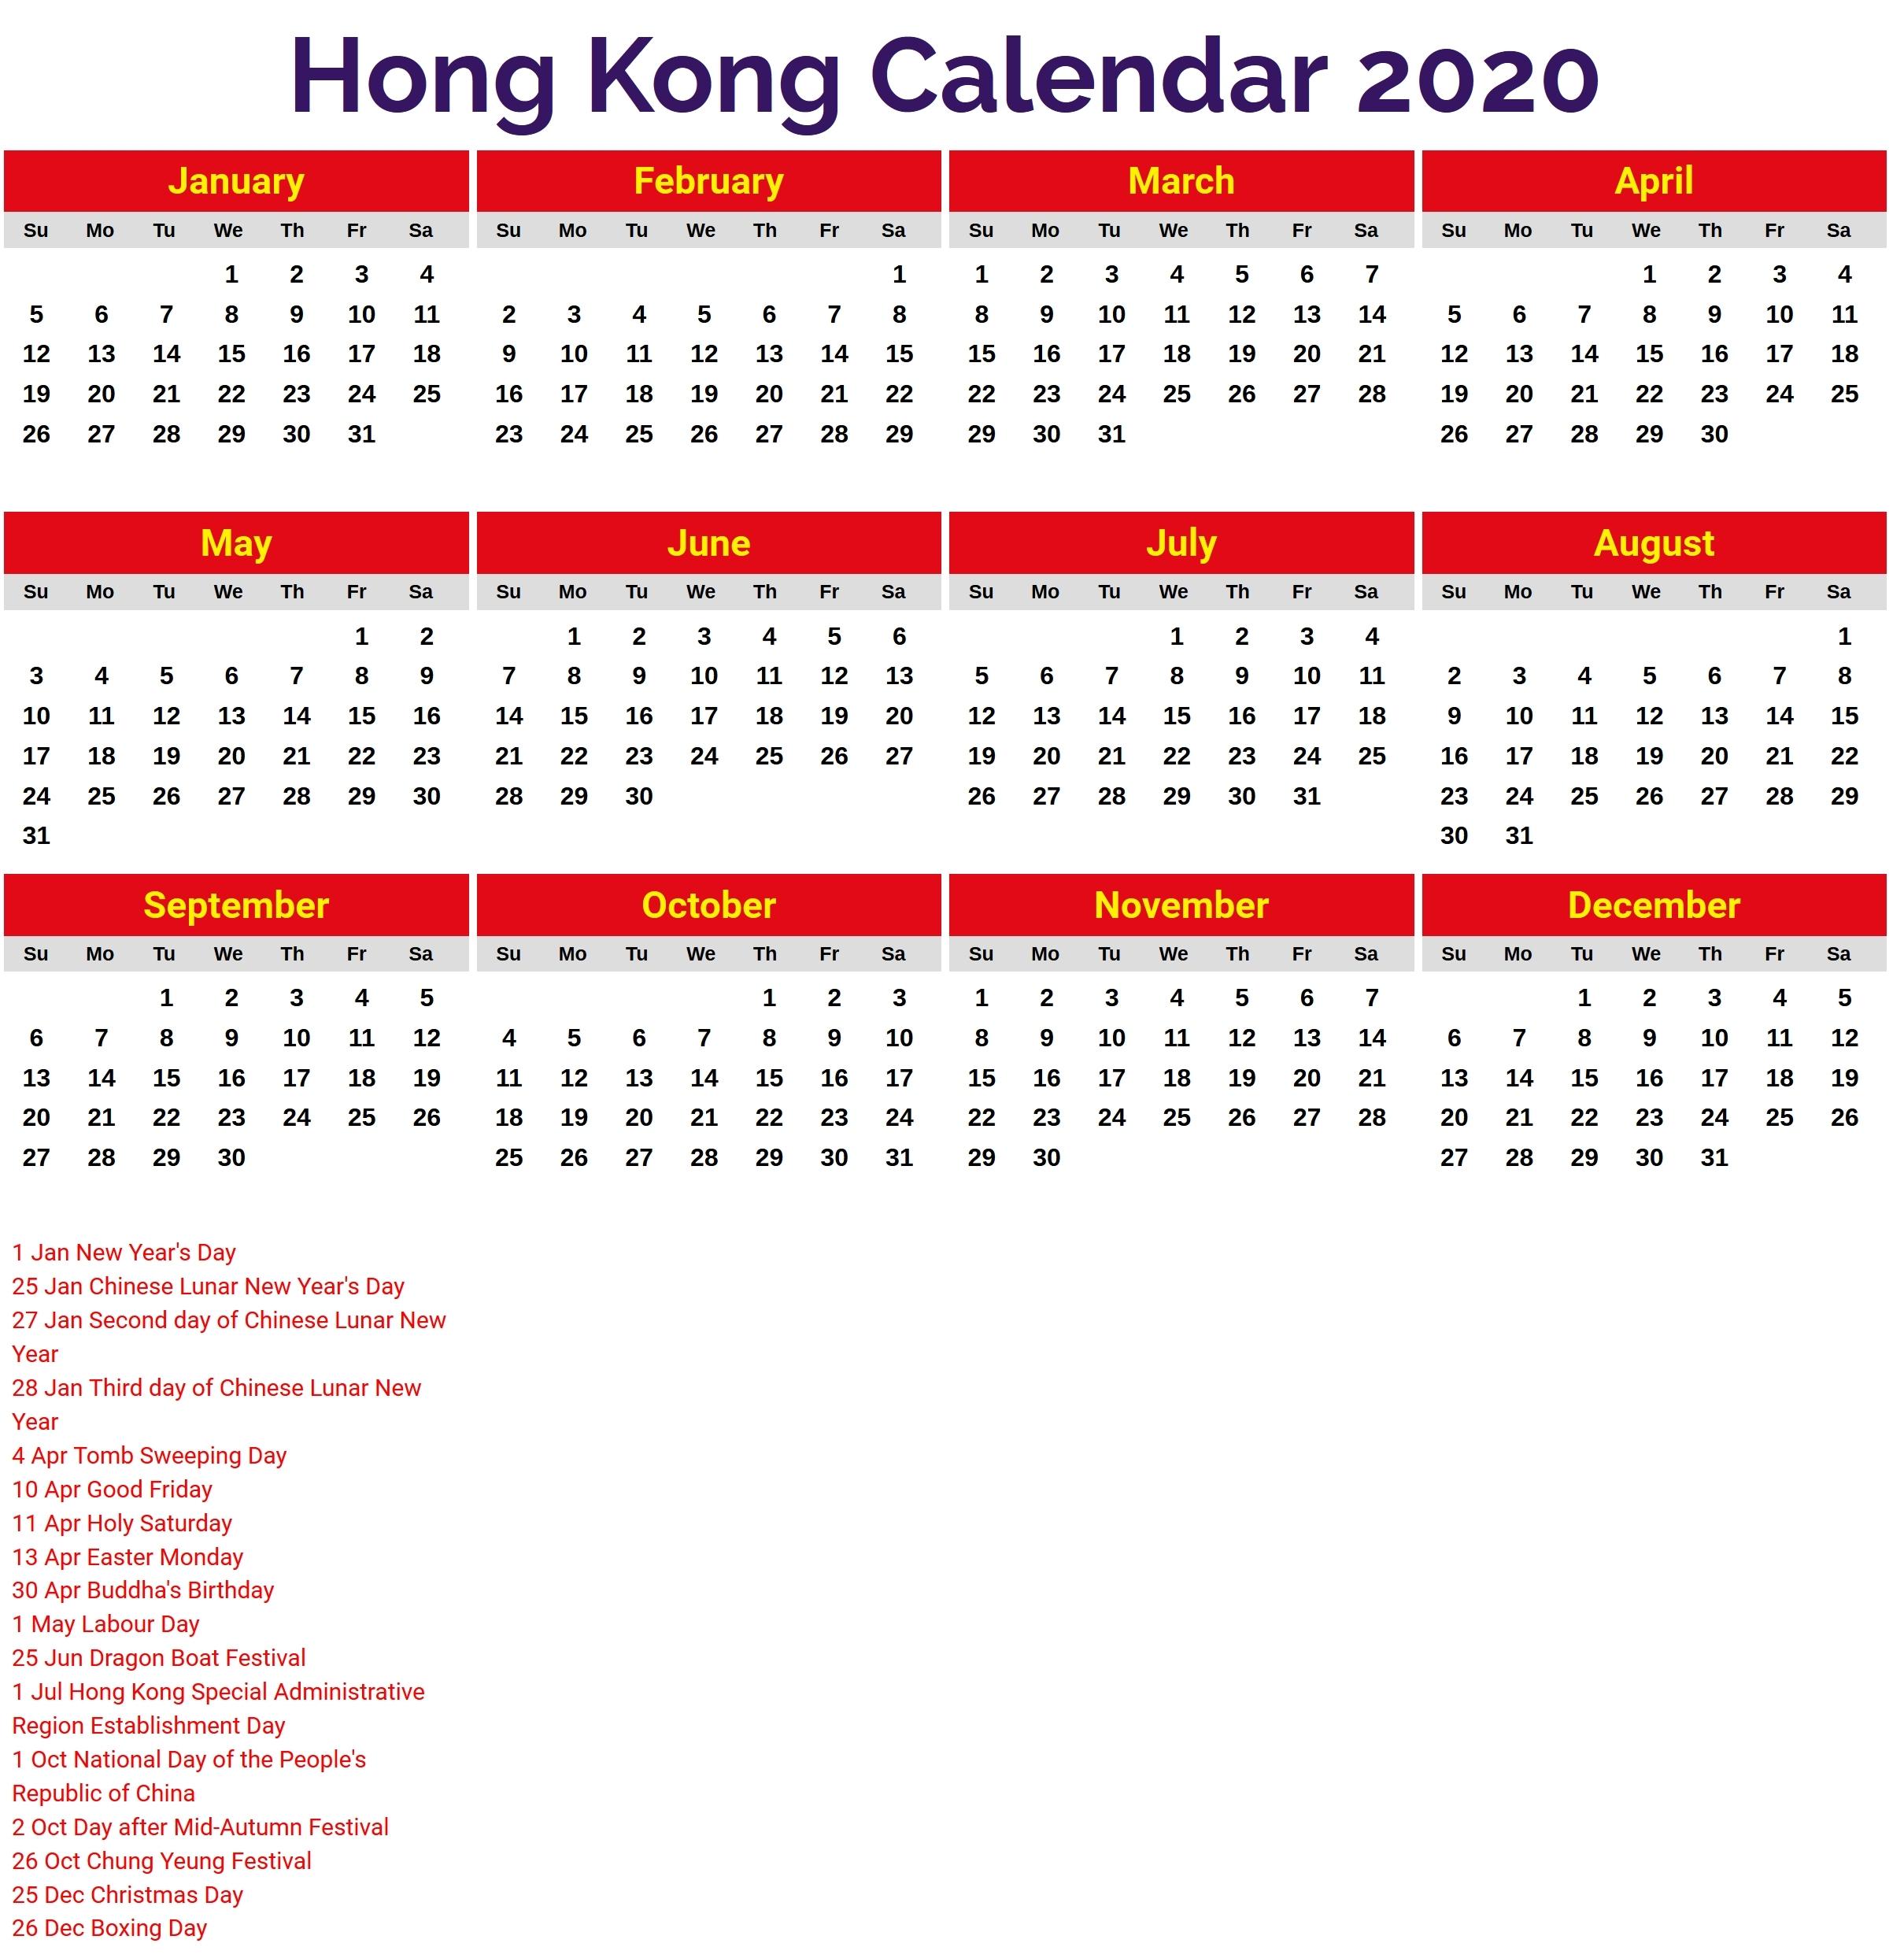 2020 Blank Hk Calender | Monthly Printable Calender